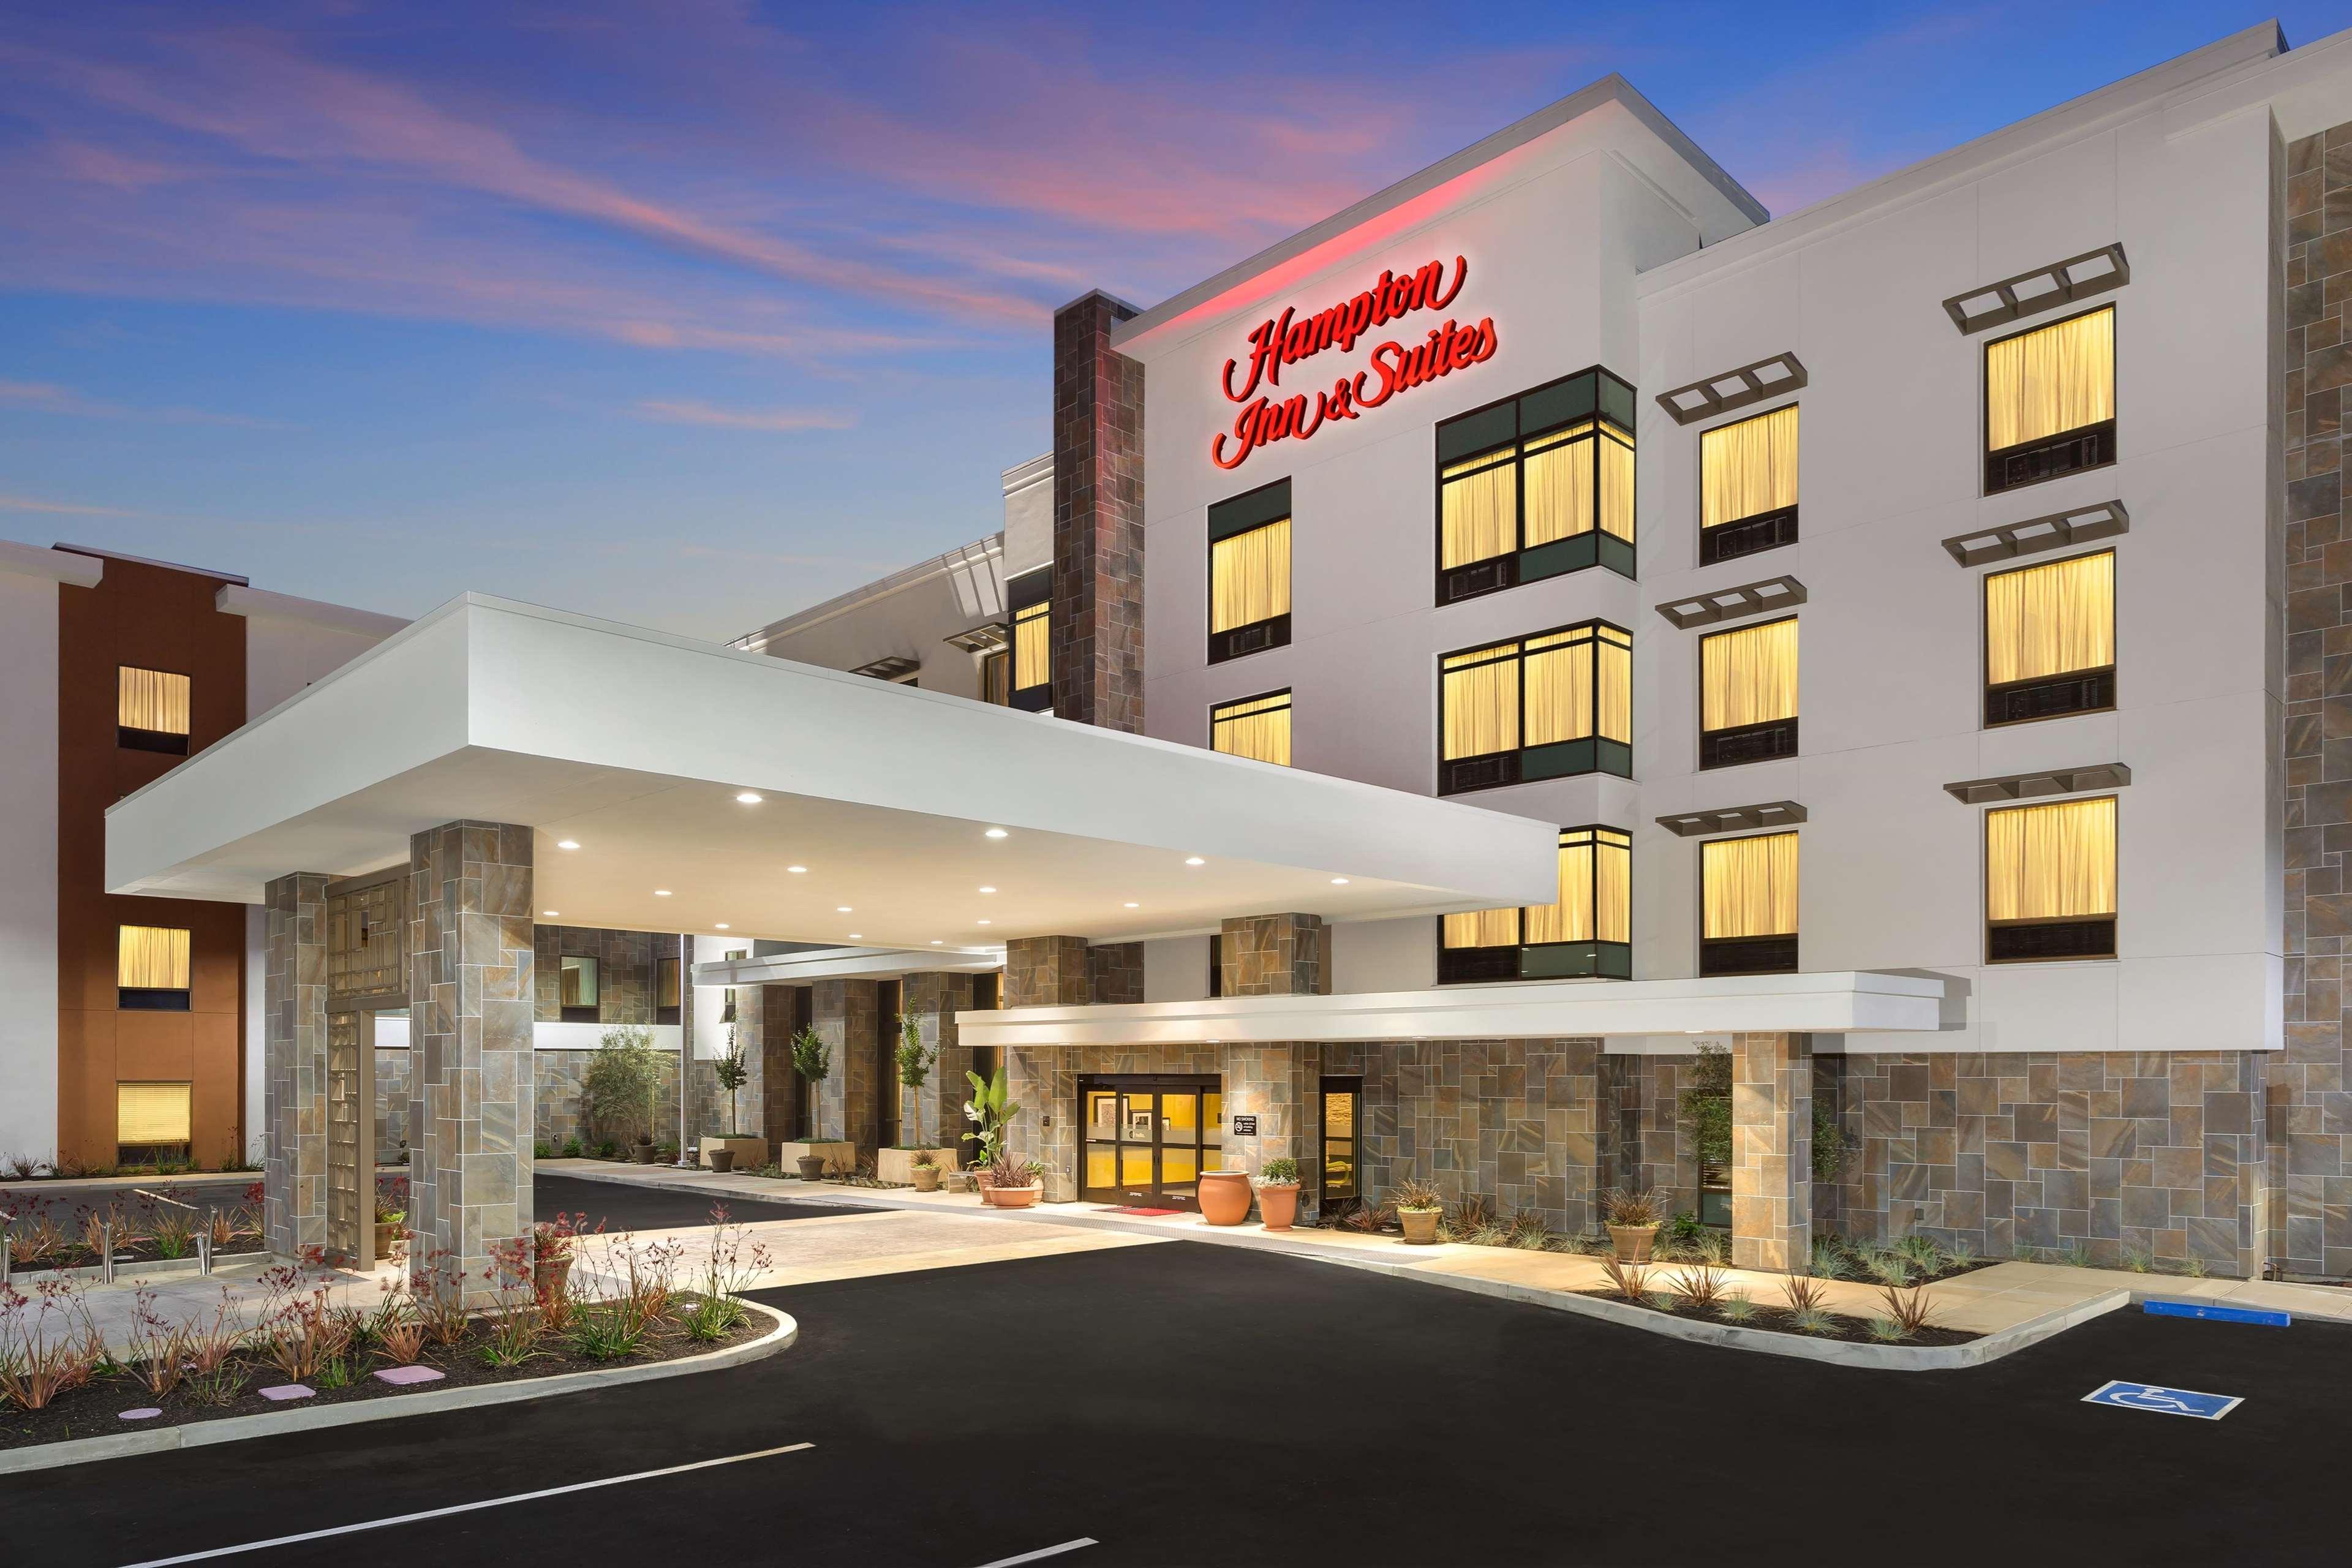 Hampton Inn & Suites Napa image 20